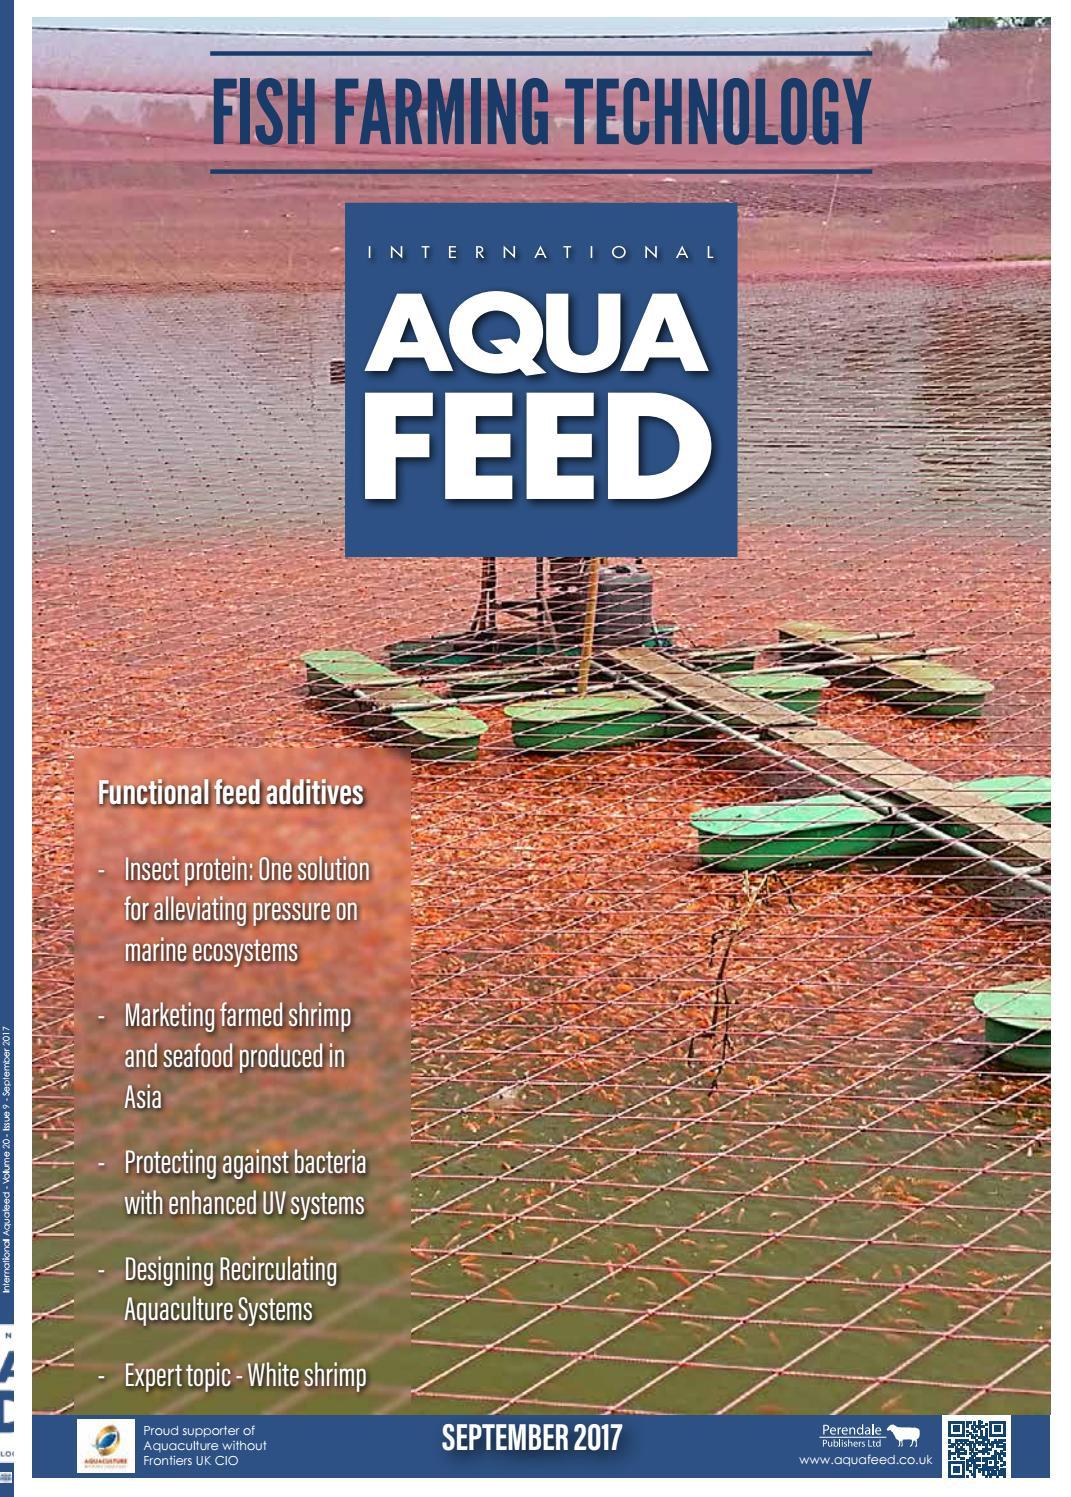 sep 2017 international aquafeed magazine by perendale publishers